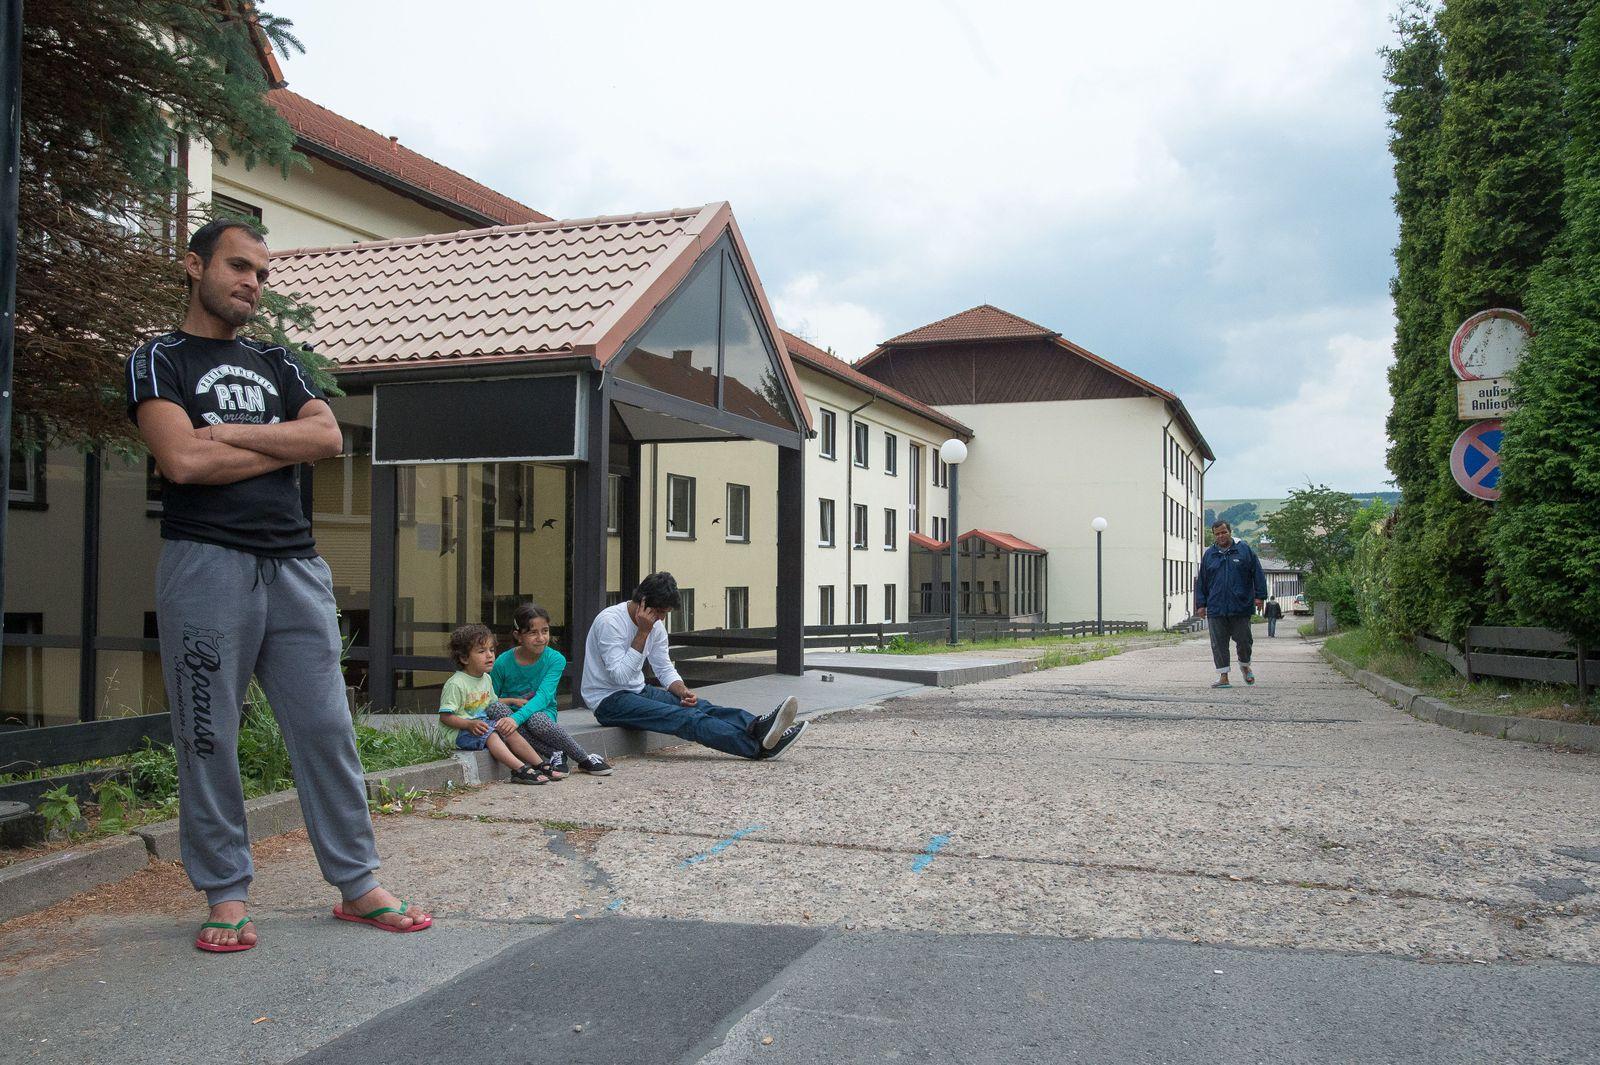 Flüchtlingsheim / Asylbewerberheim / Freital